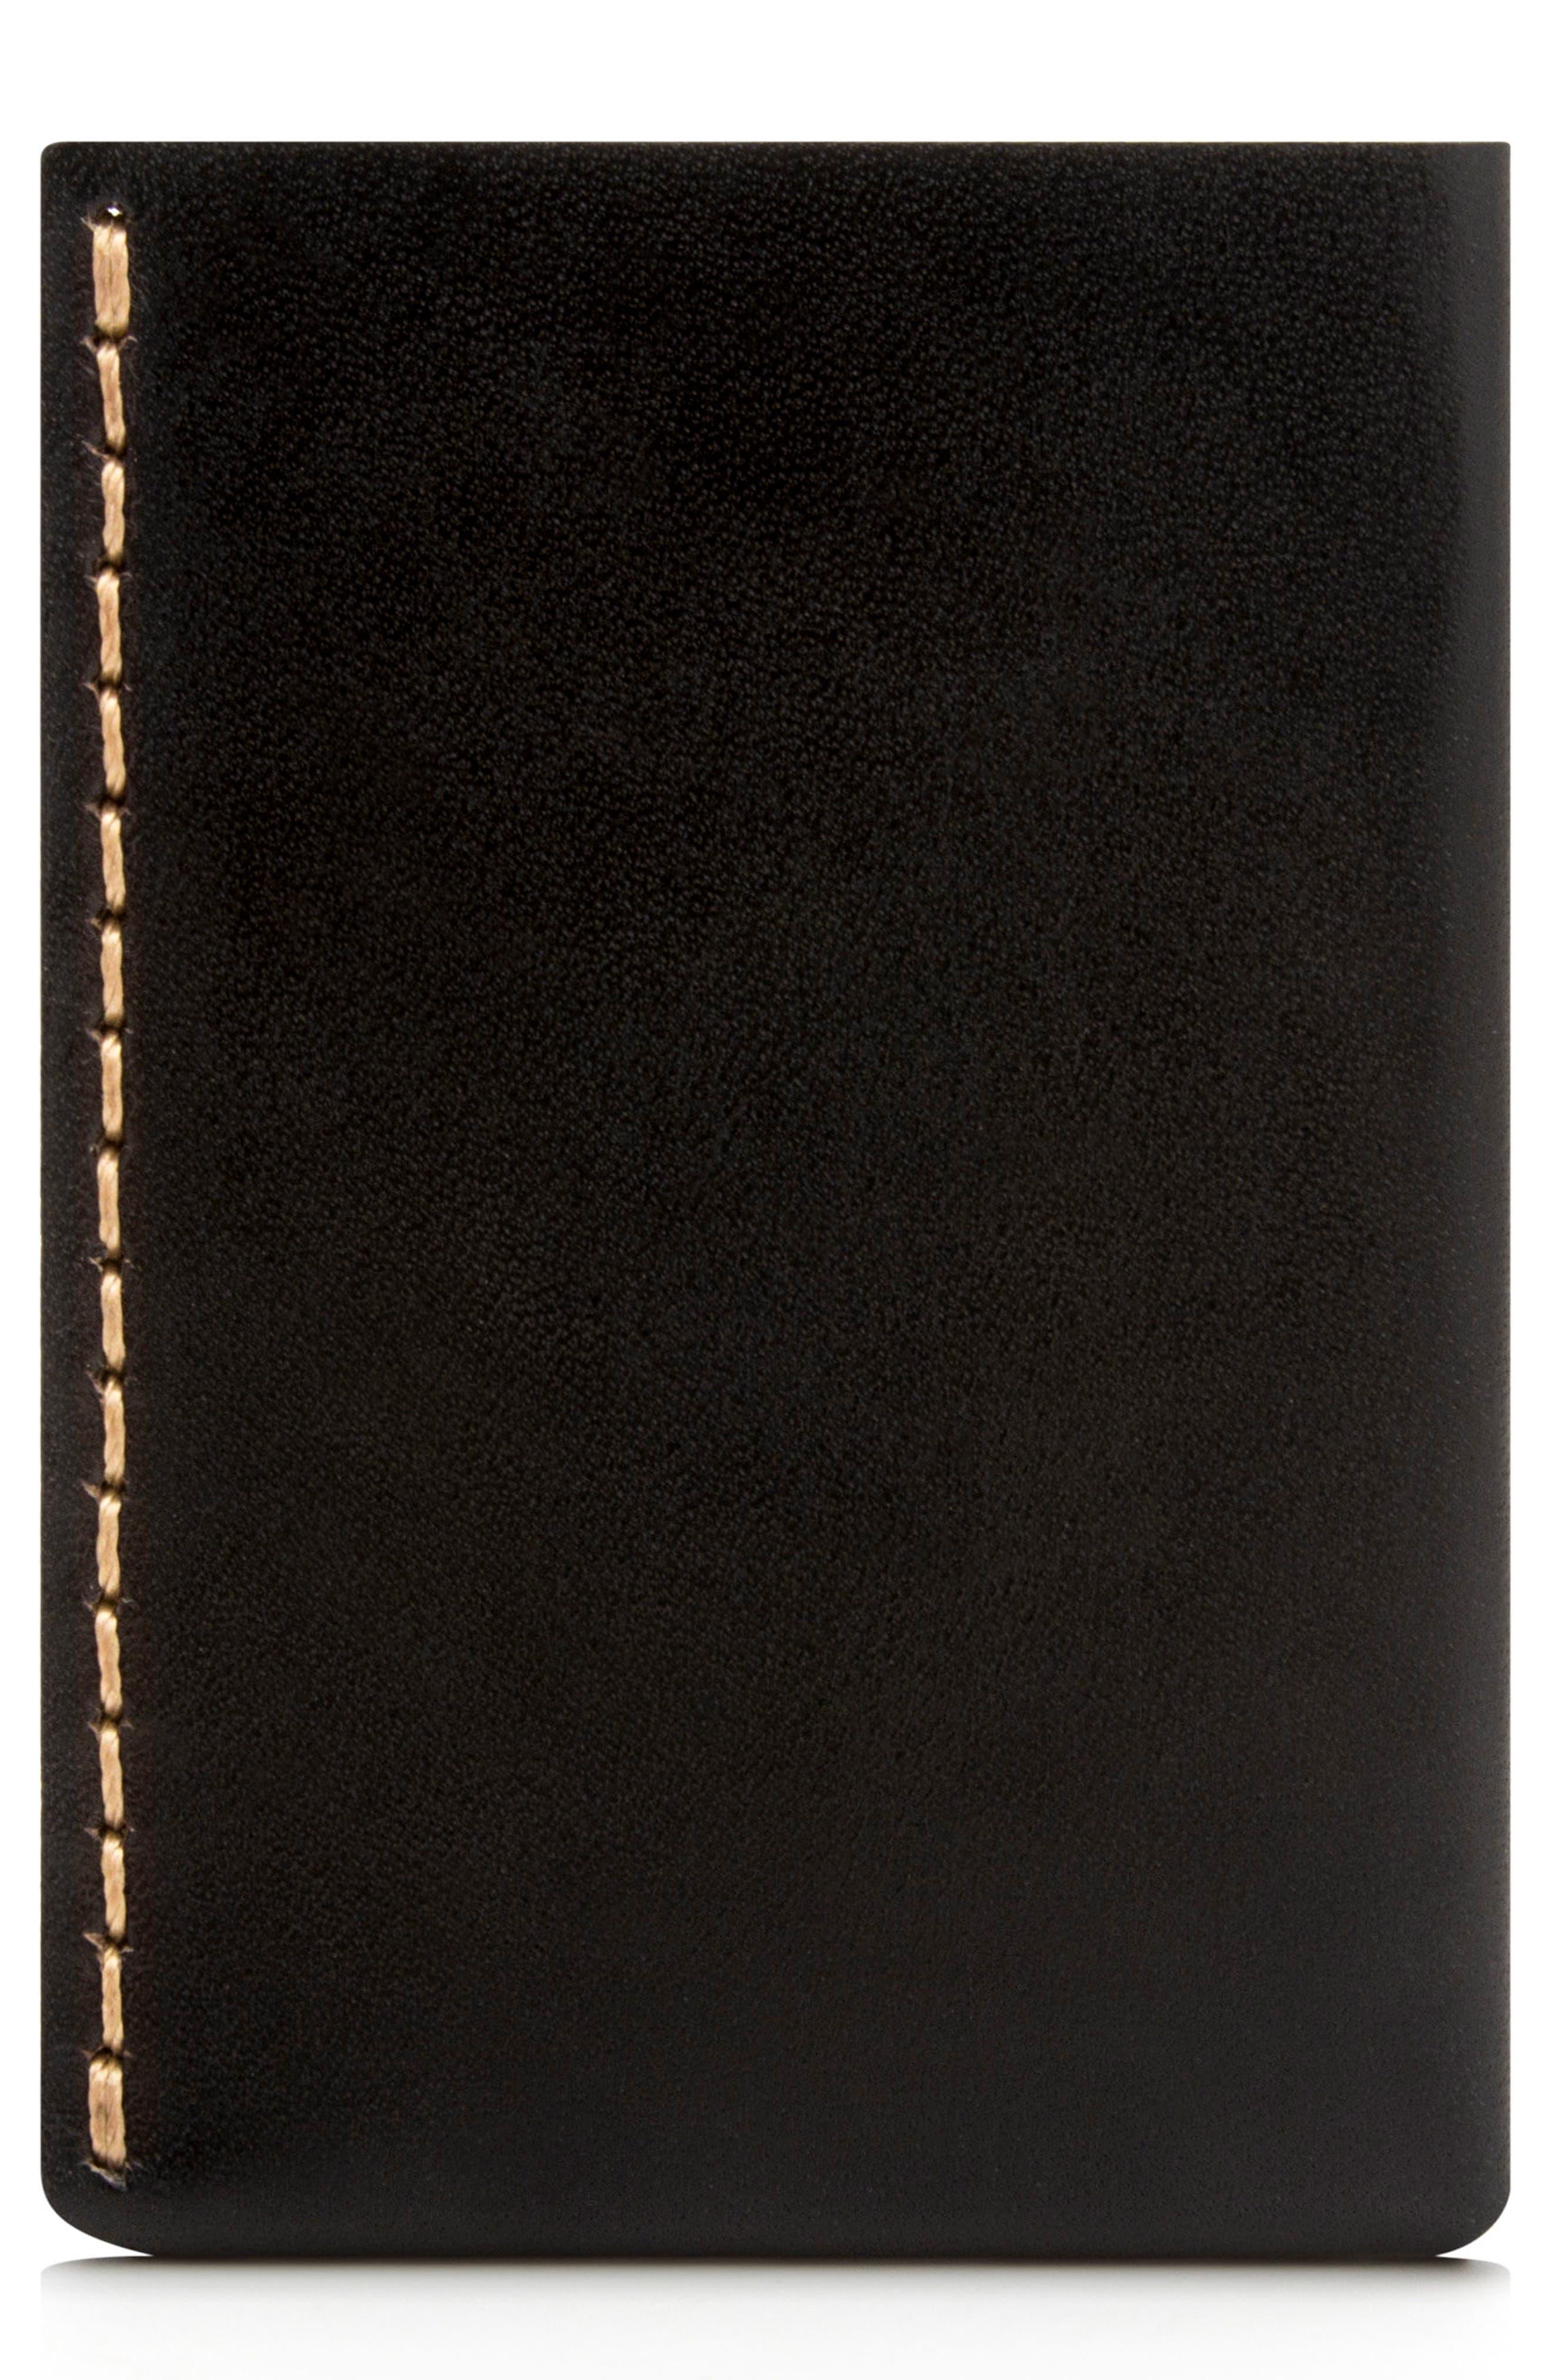 No. 7 Leather Wallet,                             Main thumbnail 1, color,                             JET TOP STITCH